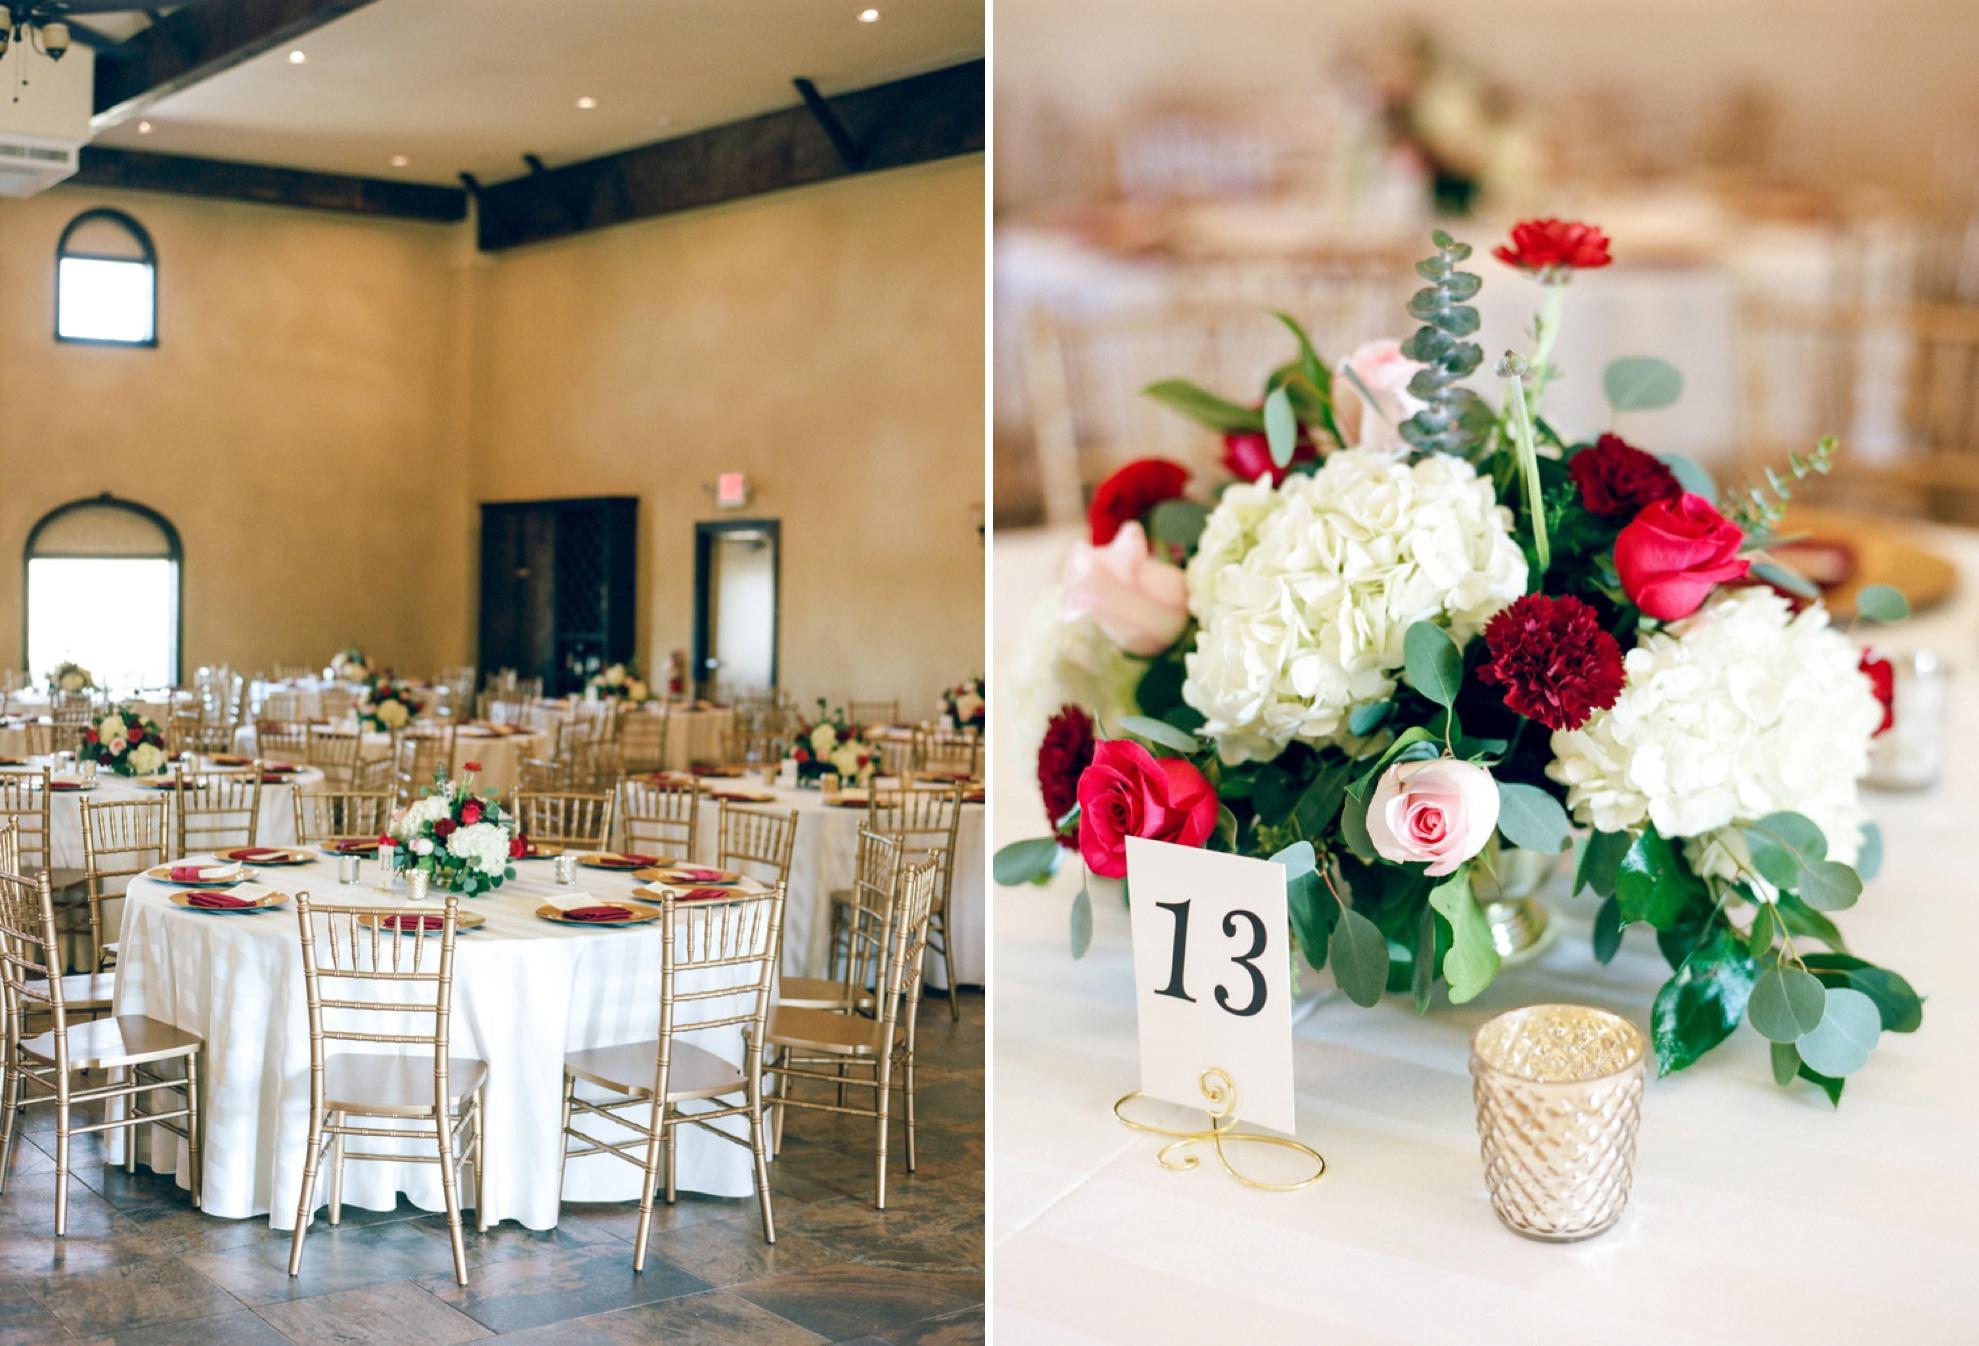 Tuscan-Courtyard-Wedding-Venue-Texas-City-Ceremony-Reception-Photographer-Dana-Fernandez-Photography-3.jpg